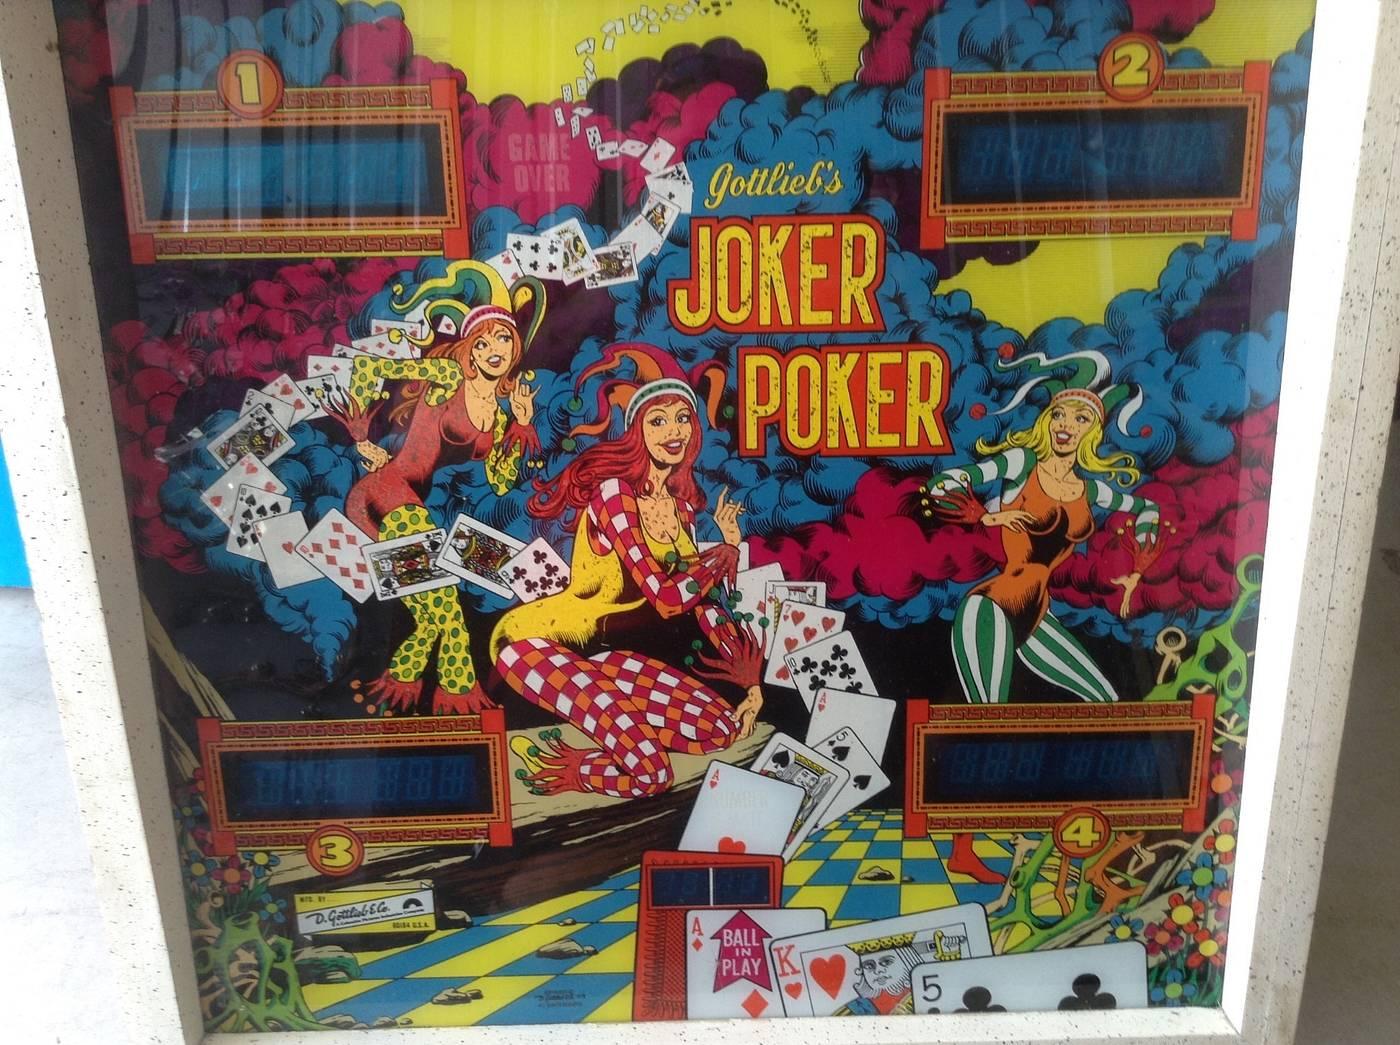 Joker Poker Pinball Value Casino Campione Tornei Di Poker